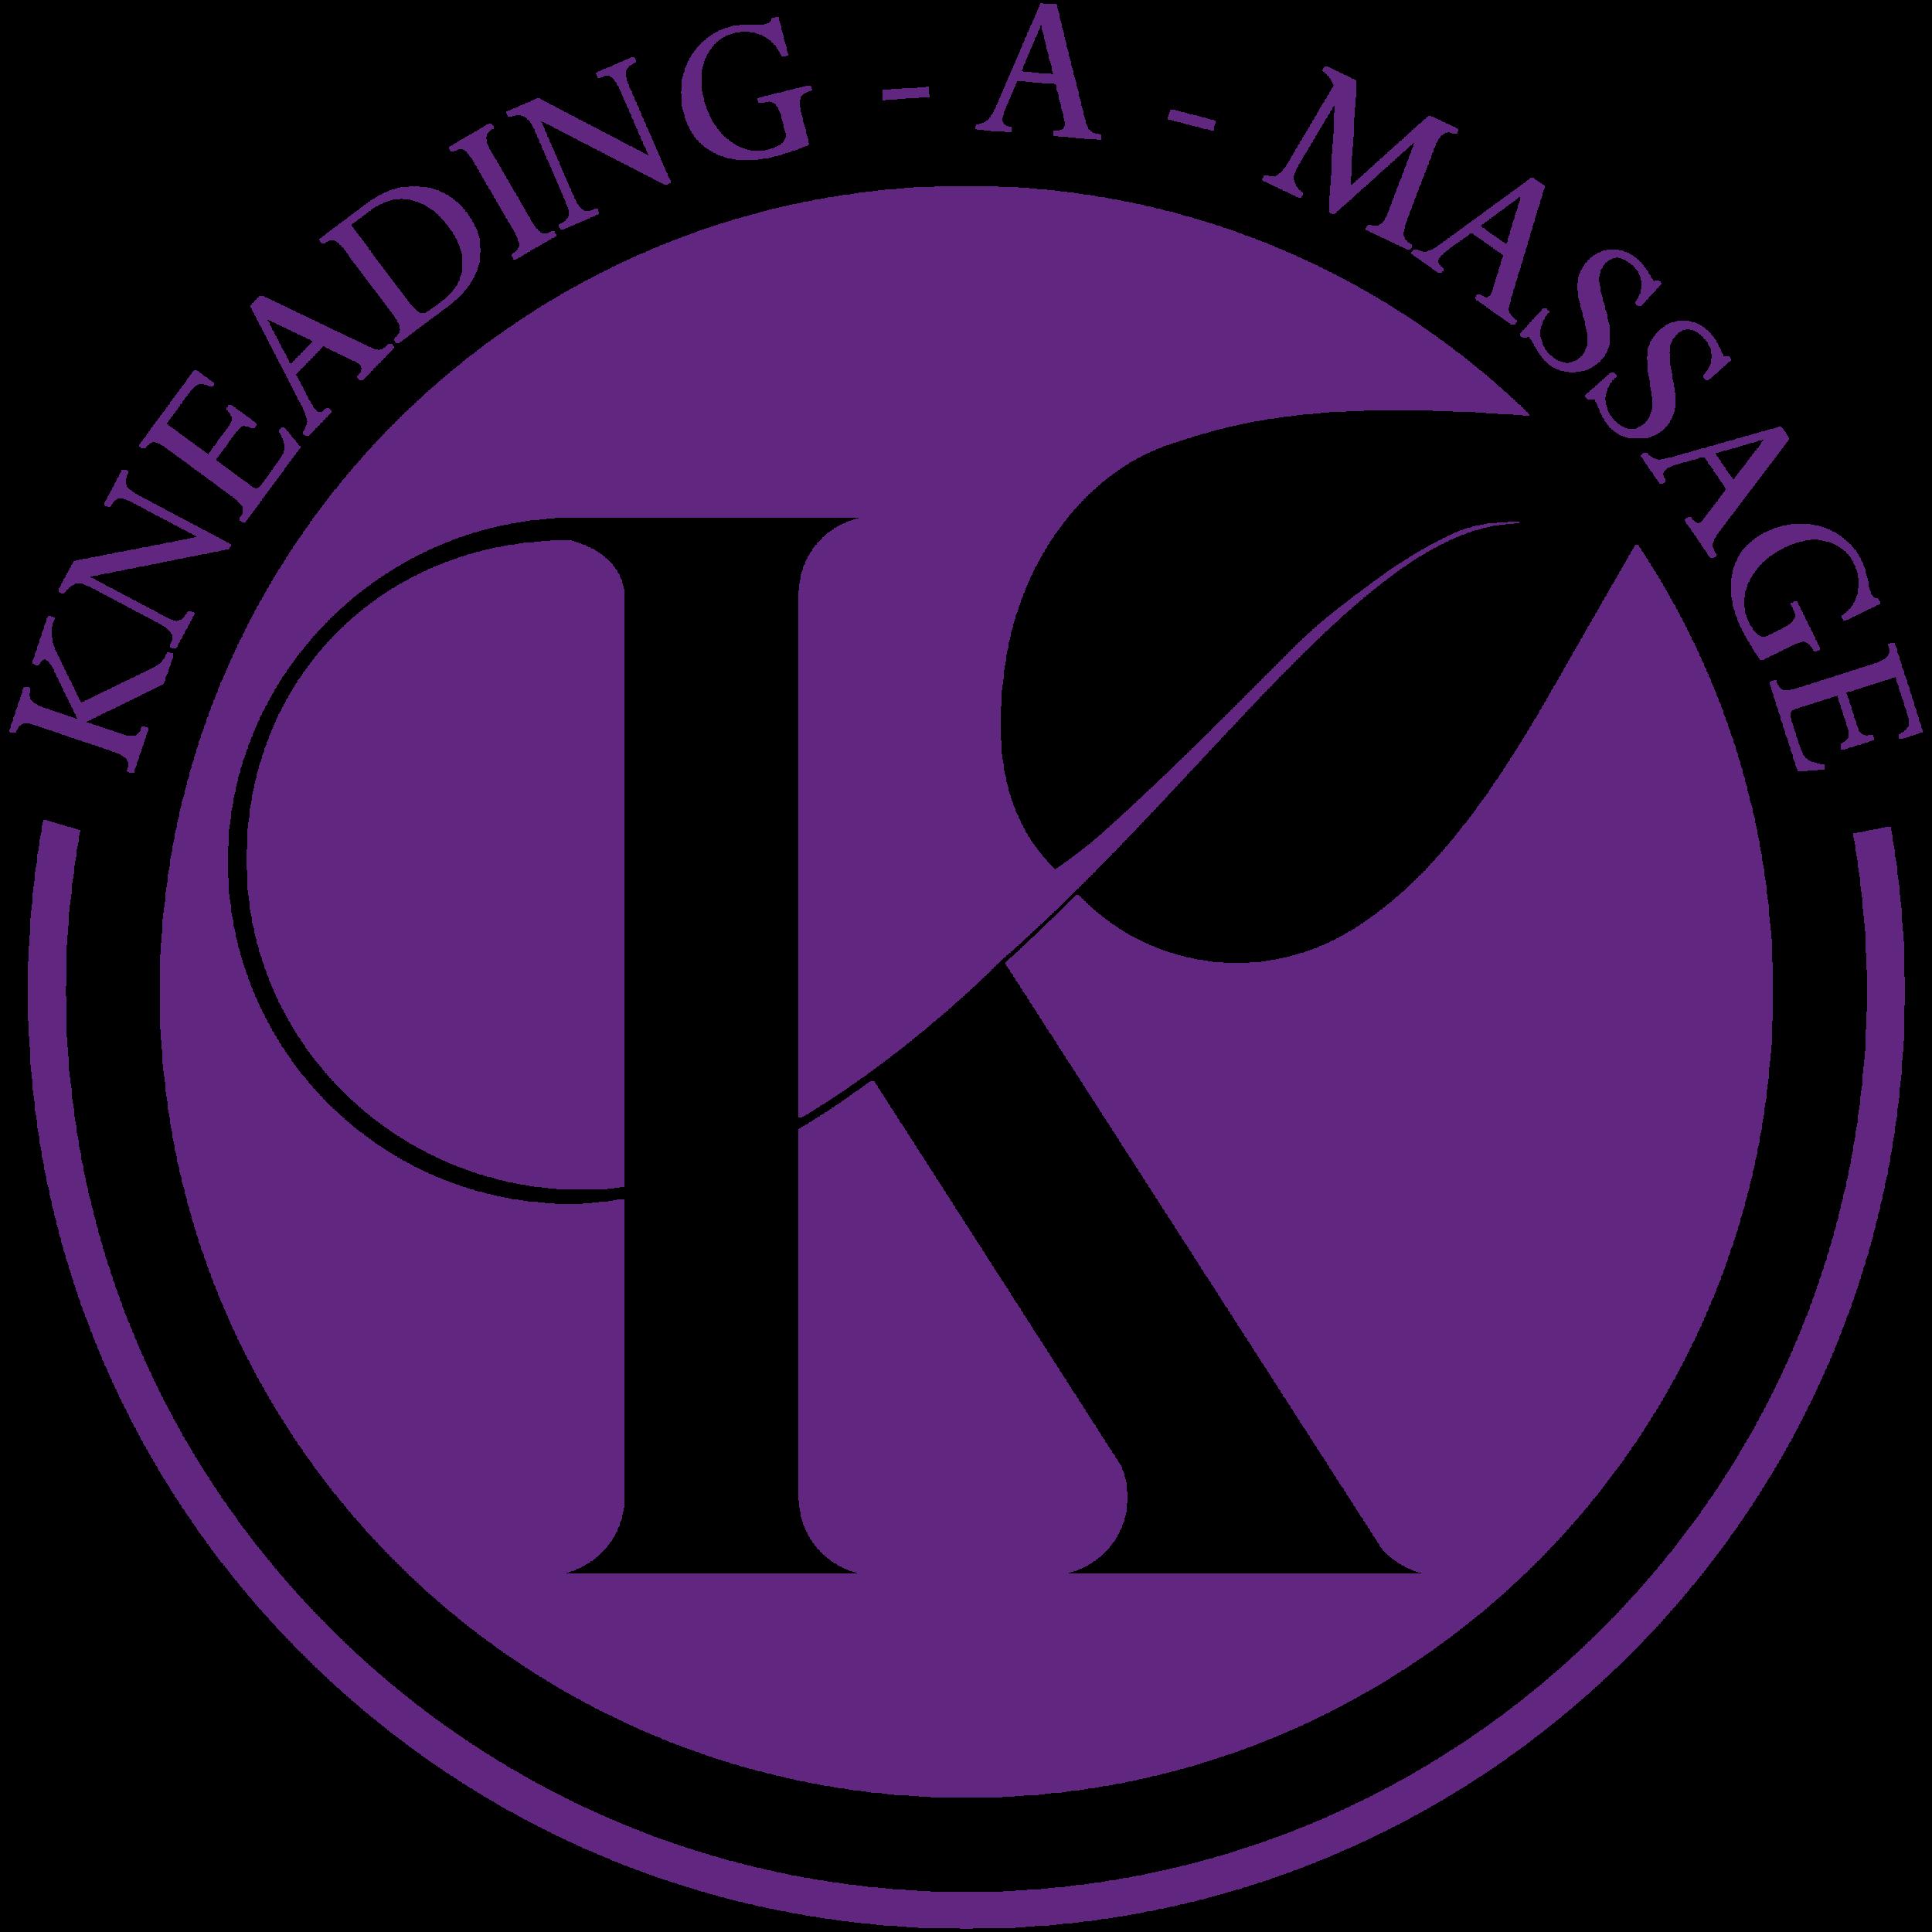 Kneading a massage logo (1).png